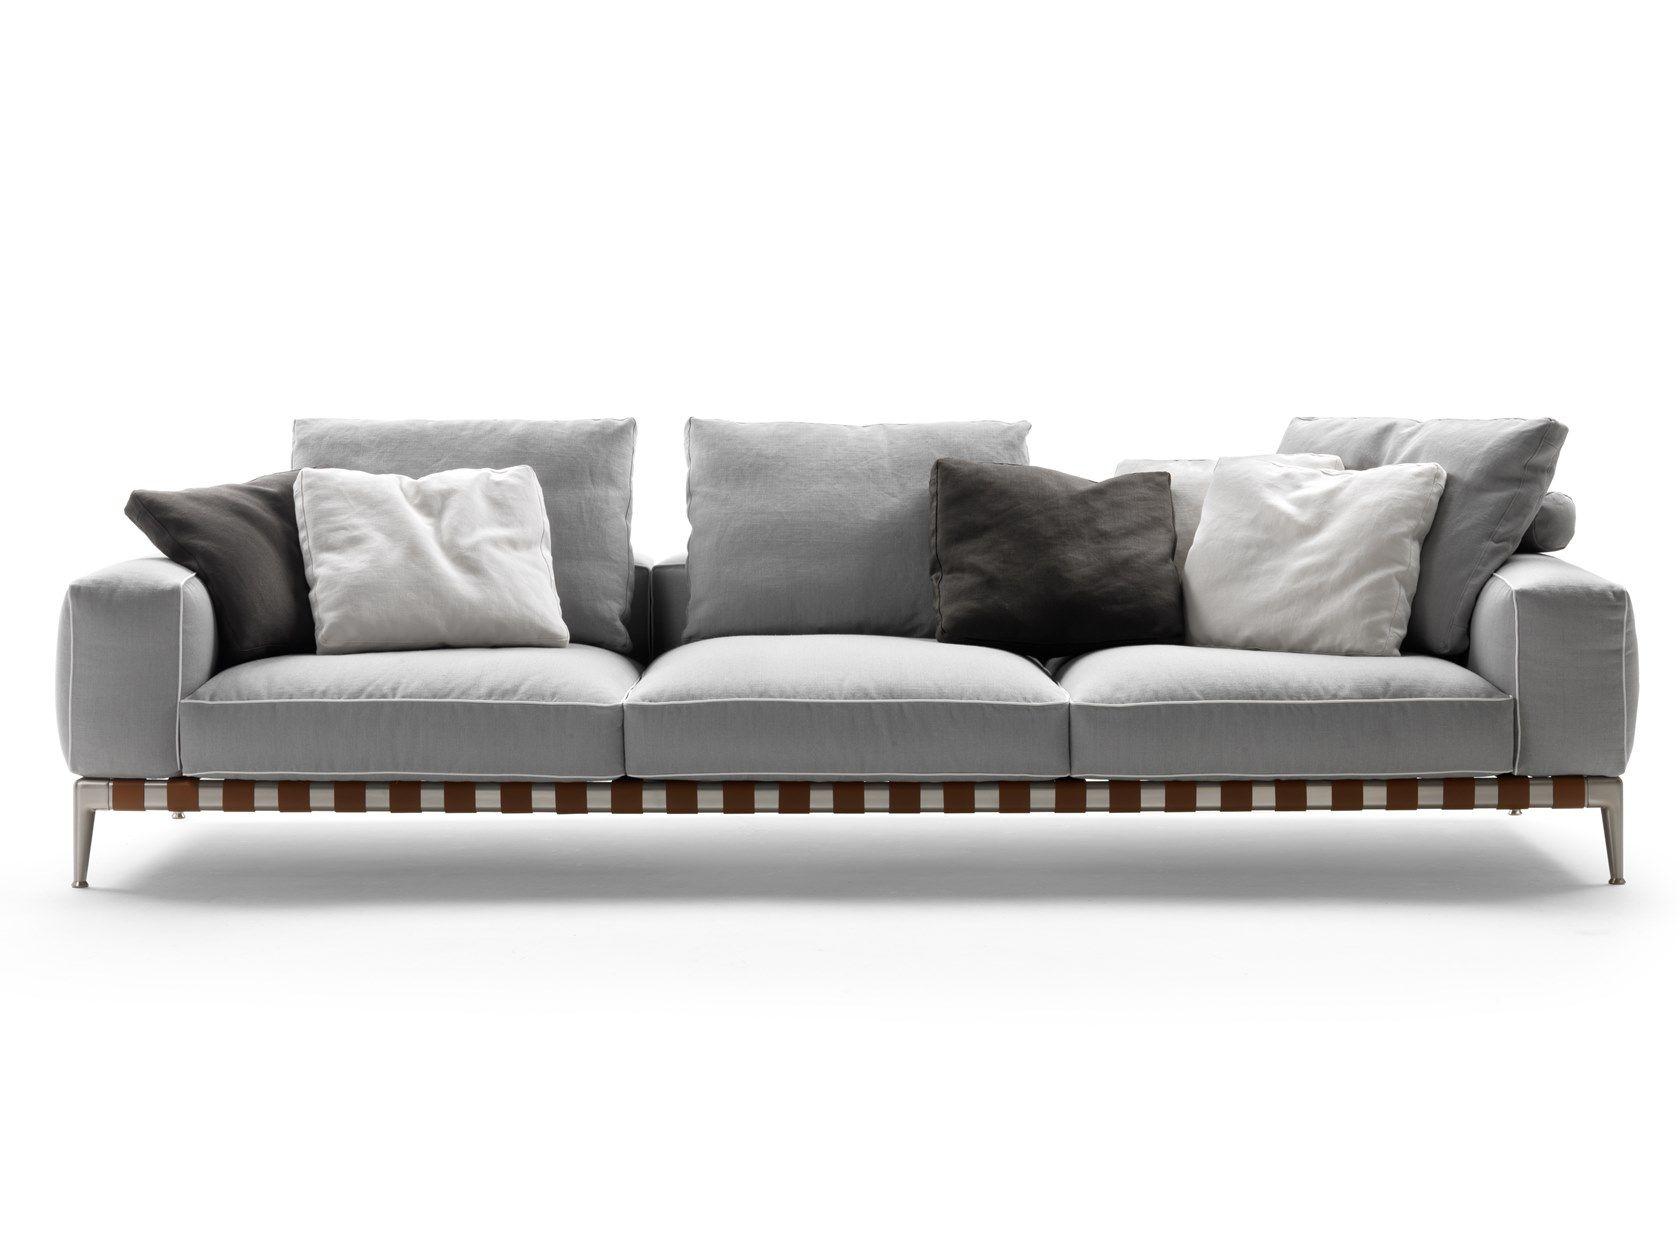 Gregory Sectional Sofa Gregory Collection By Flexform Design Antonio Citterio Sectional Sofa Flexform Sofa